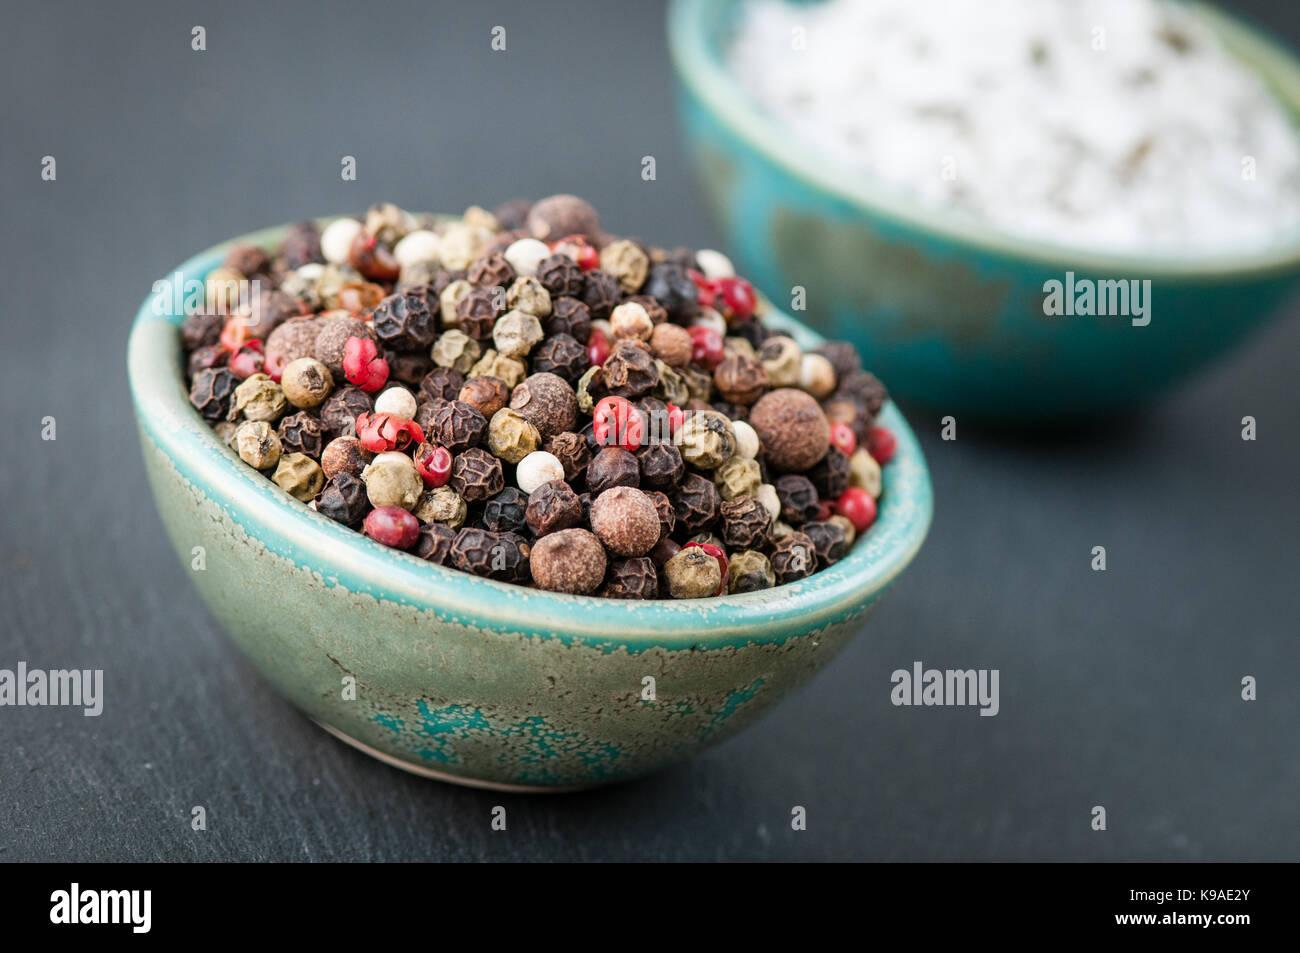 Sea Salt & Pepper Corn Condiment Still Lifes - Stock Image